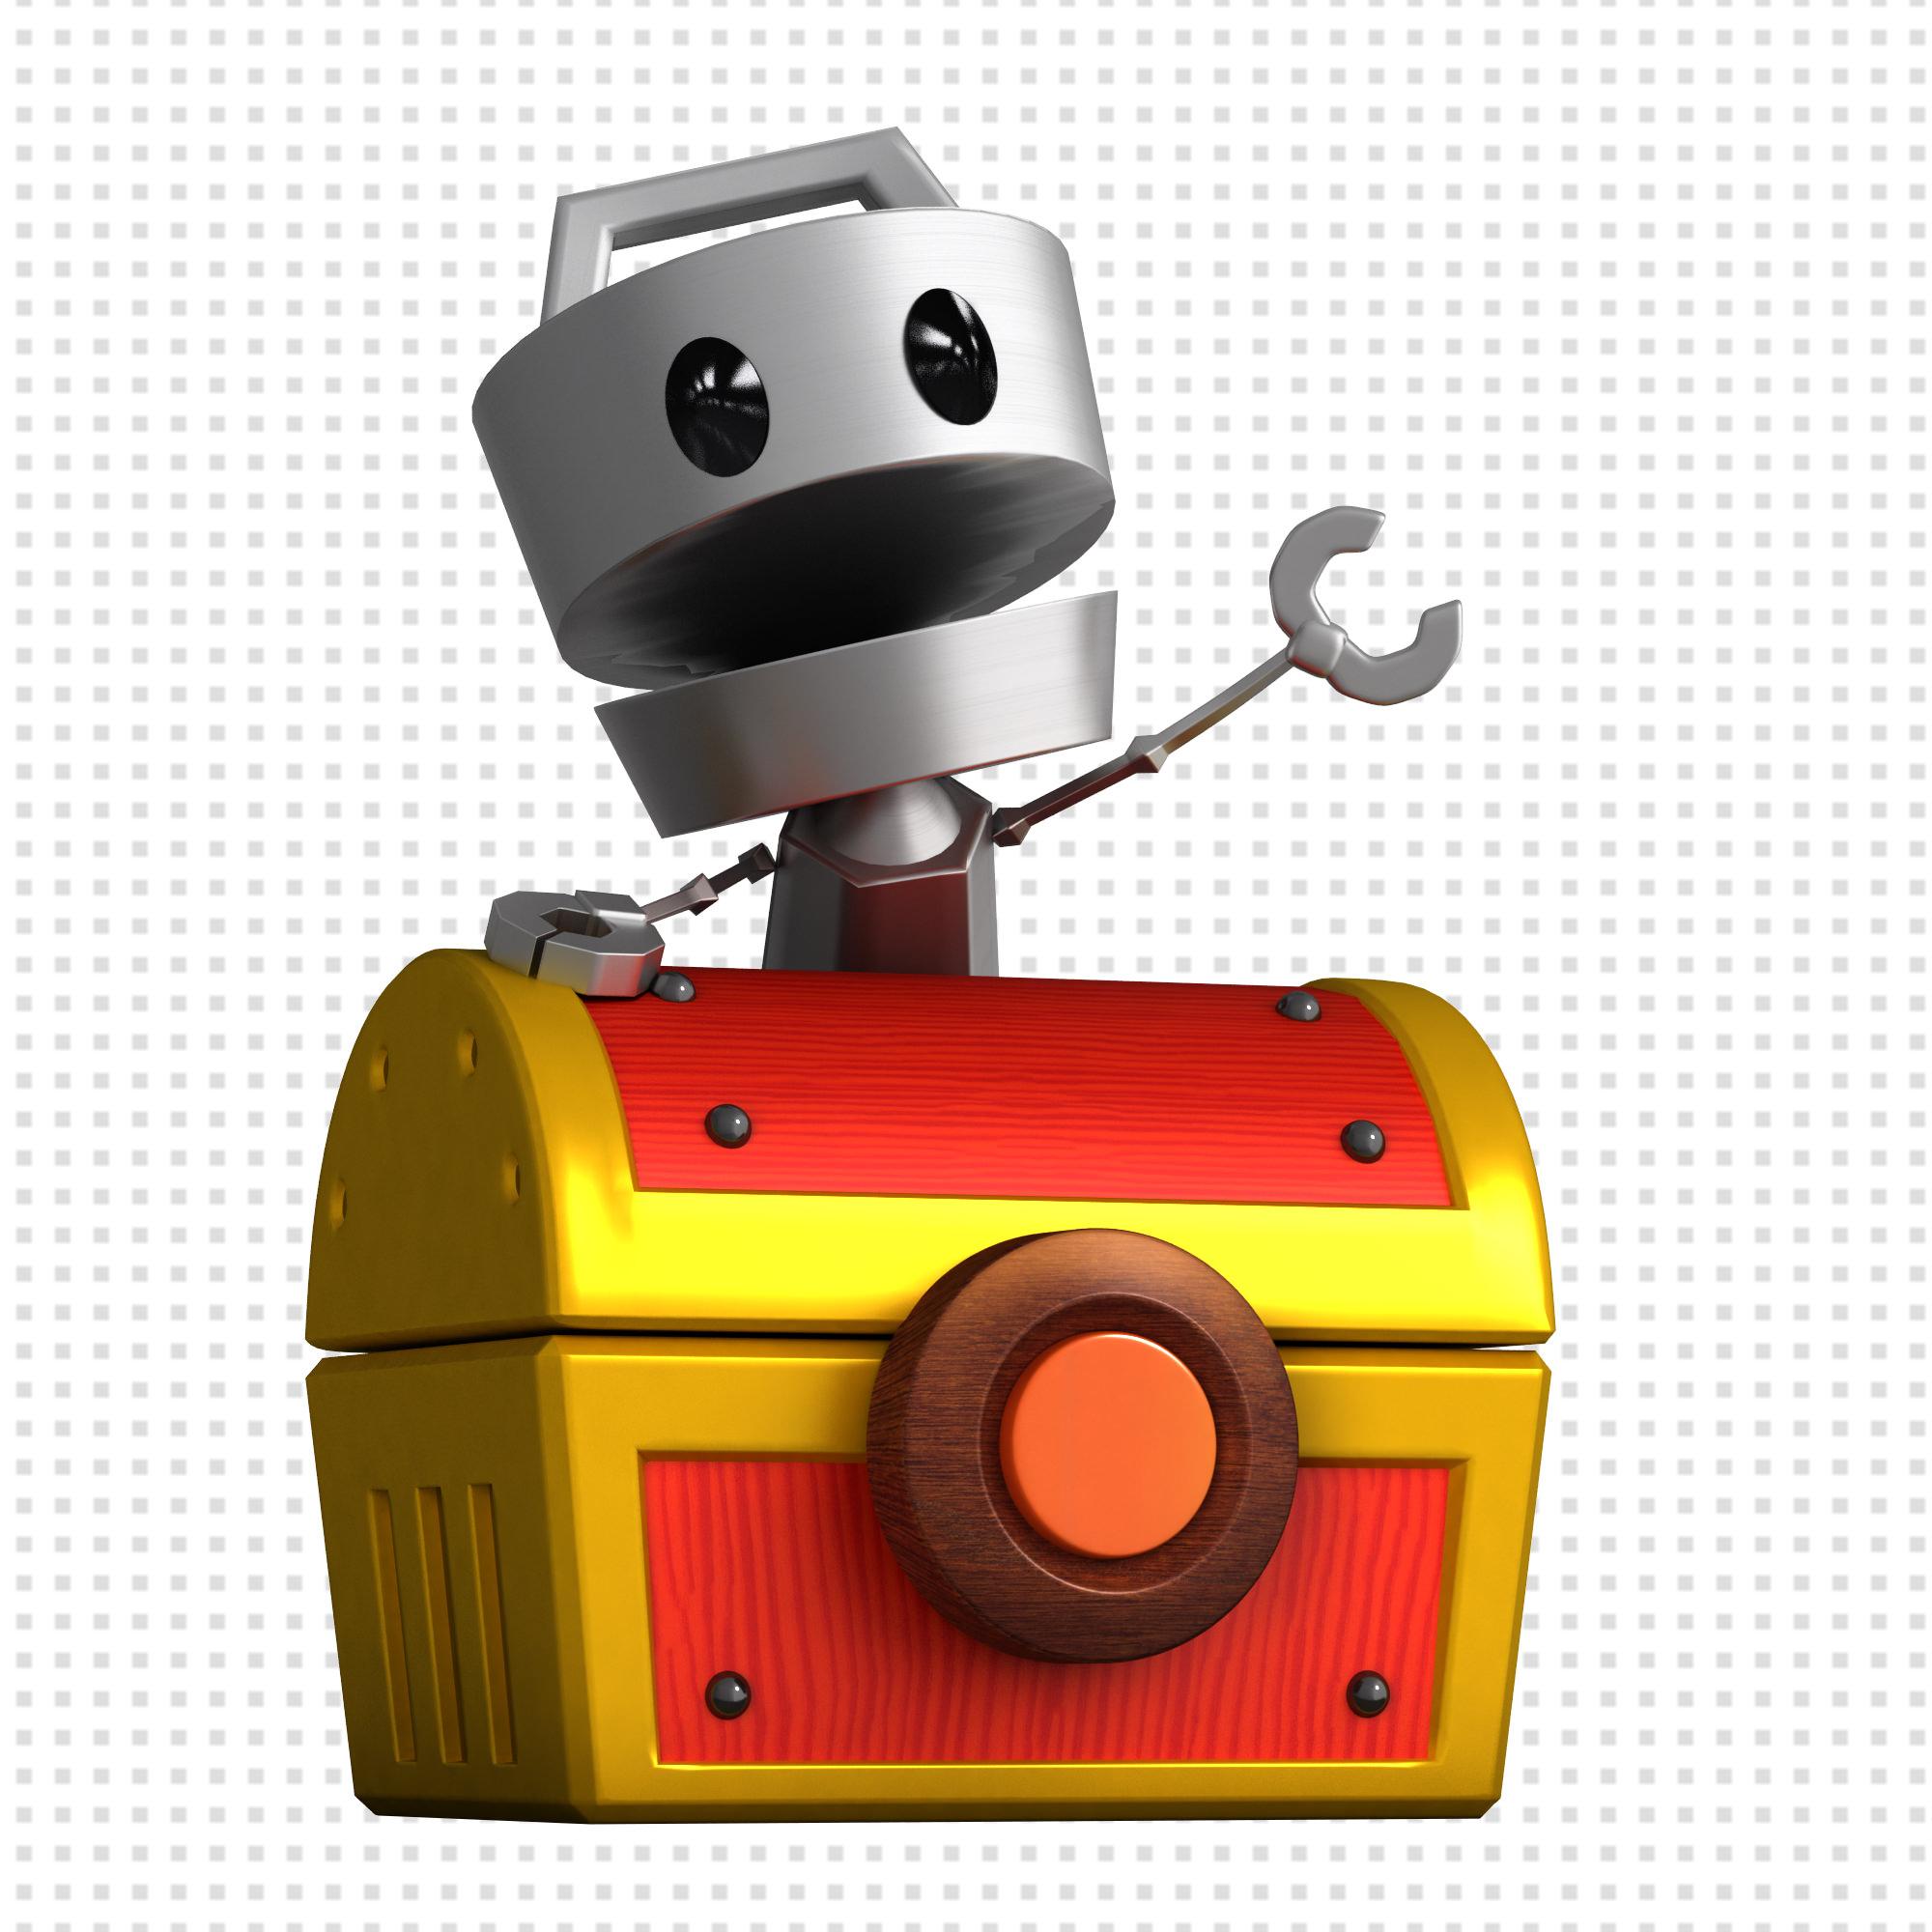 Chibi-Robo Zip Lash (3DS)